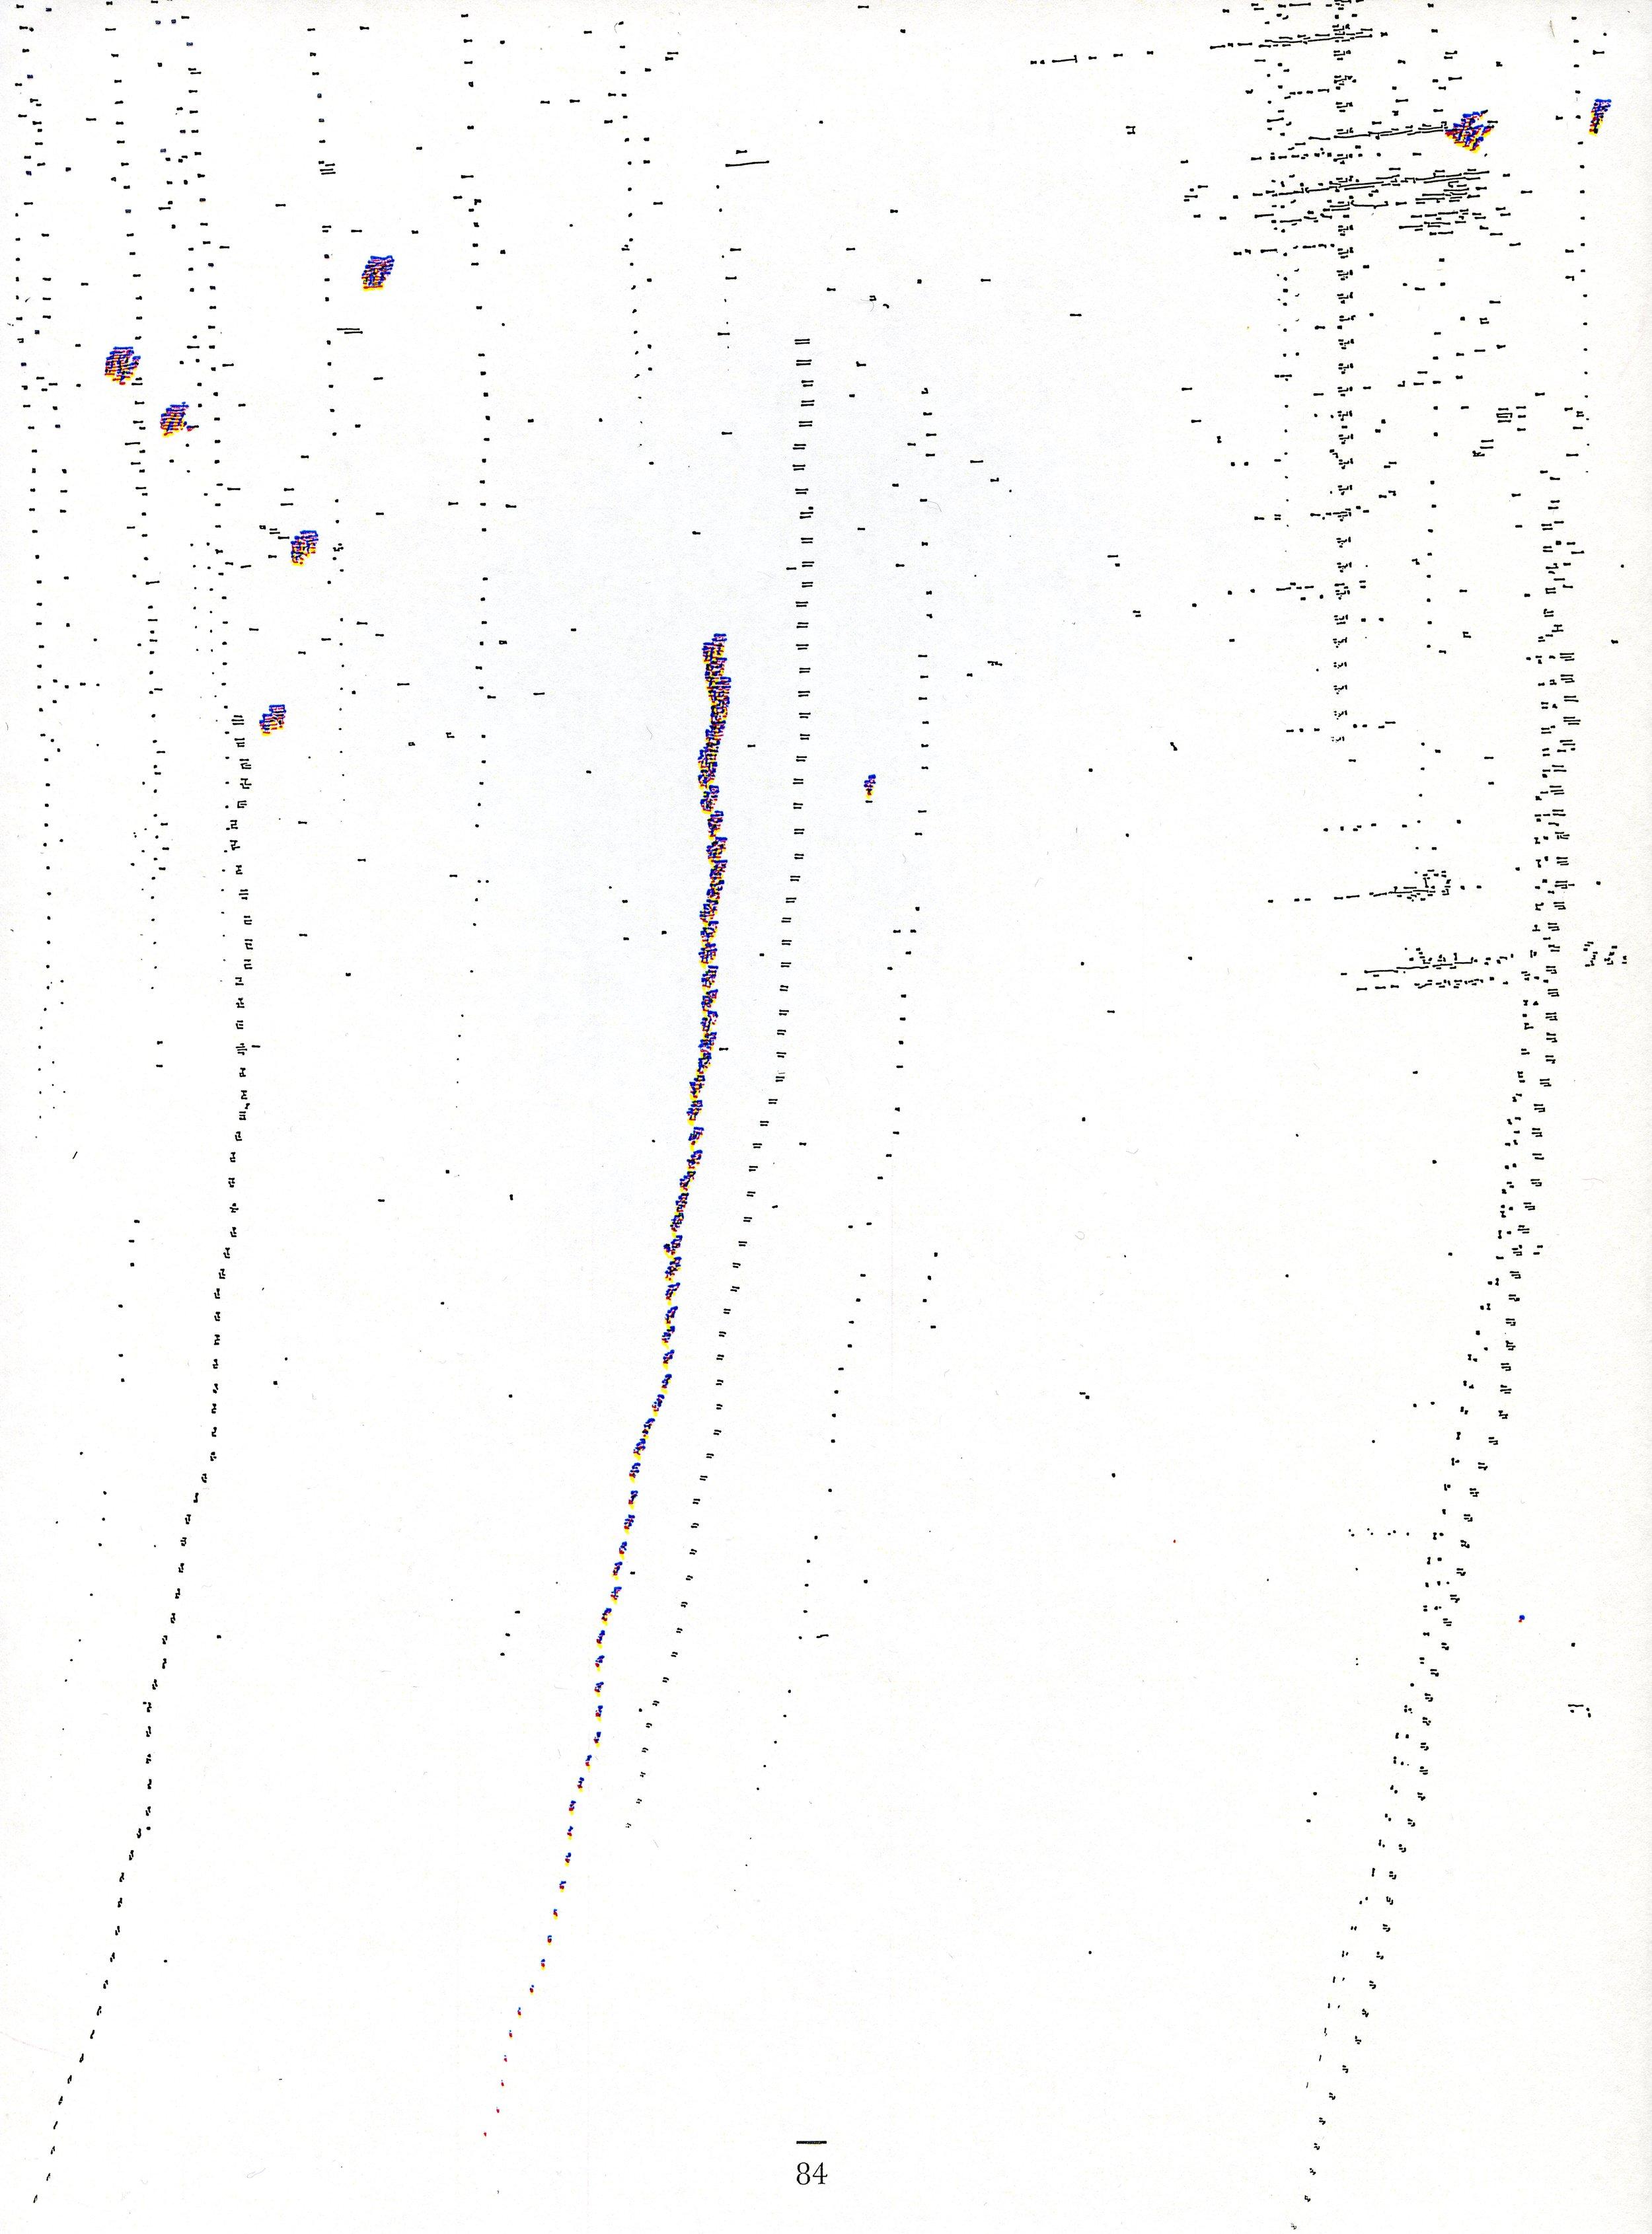 Maakbaarheid017.jpg